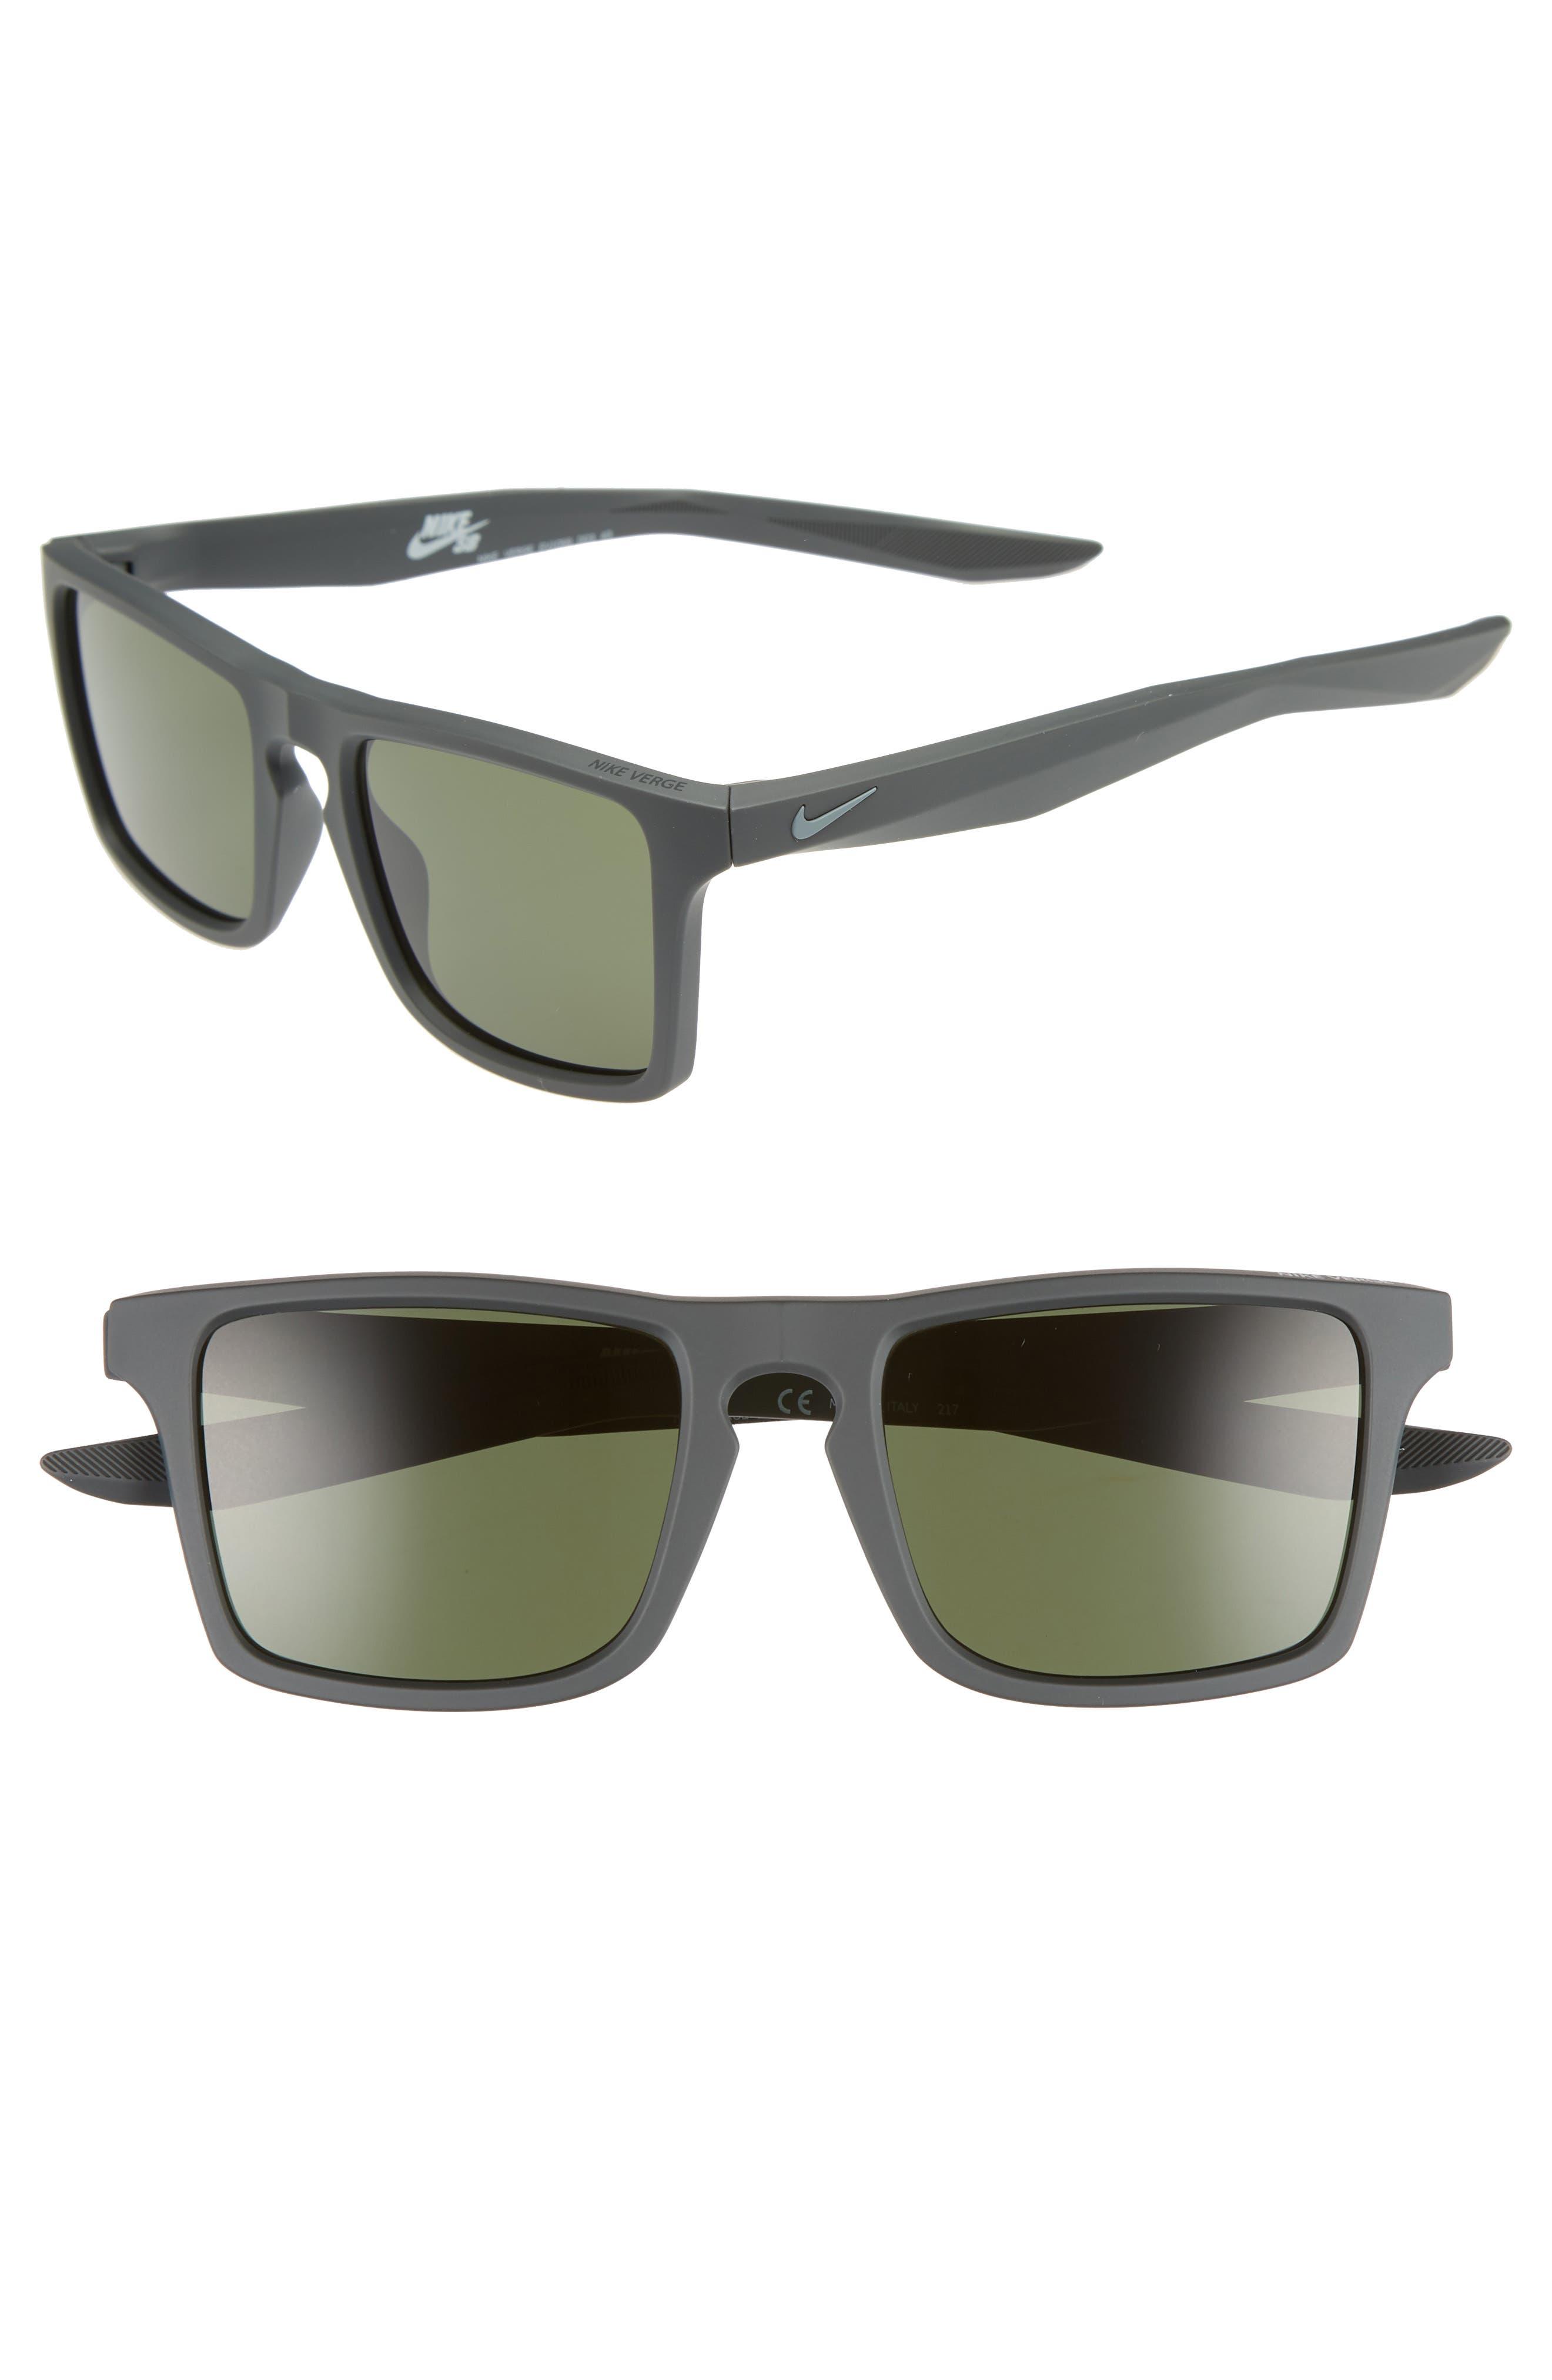 50b8156a2f1f Buy nike golf legend sunglasses | Up to 79% Discounts